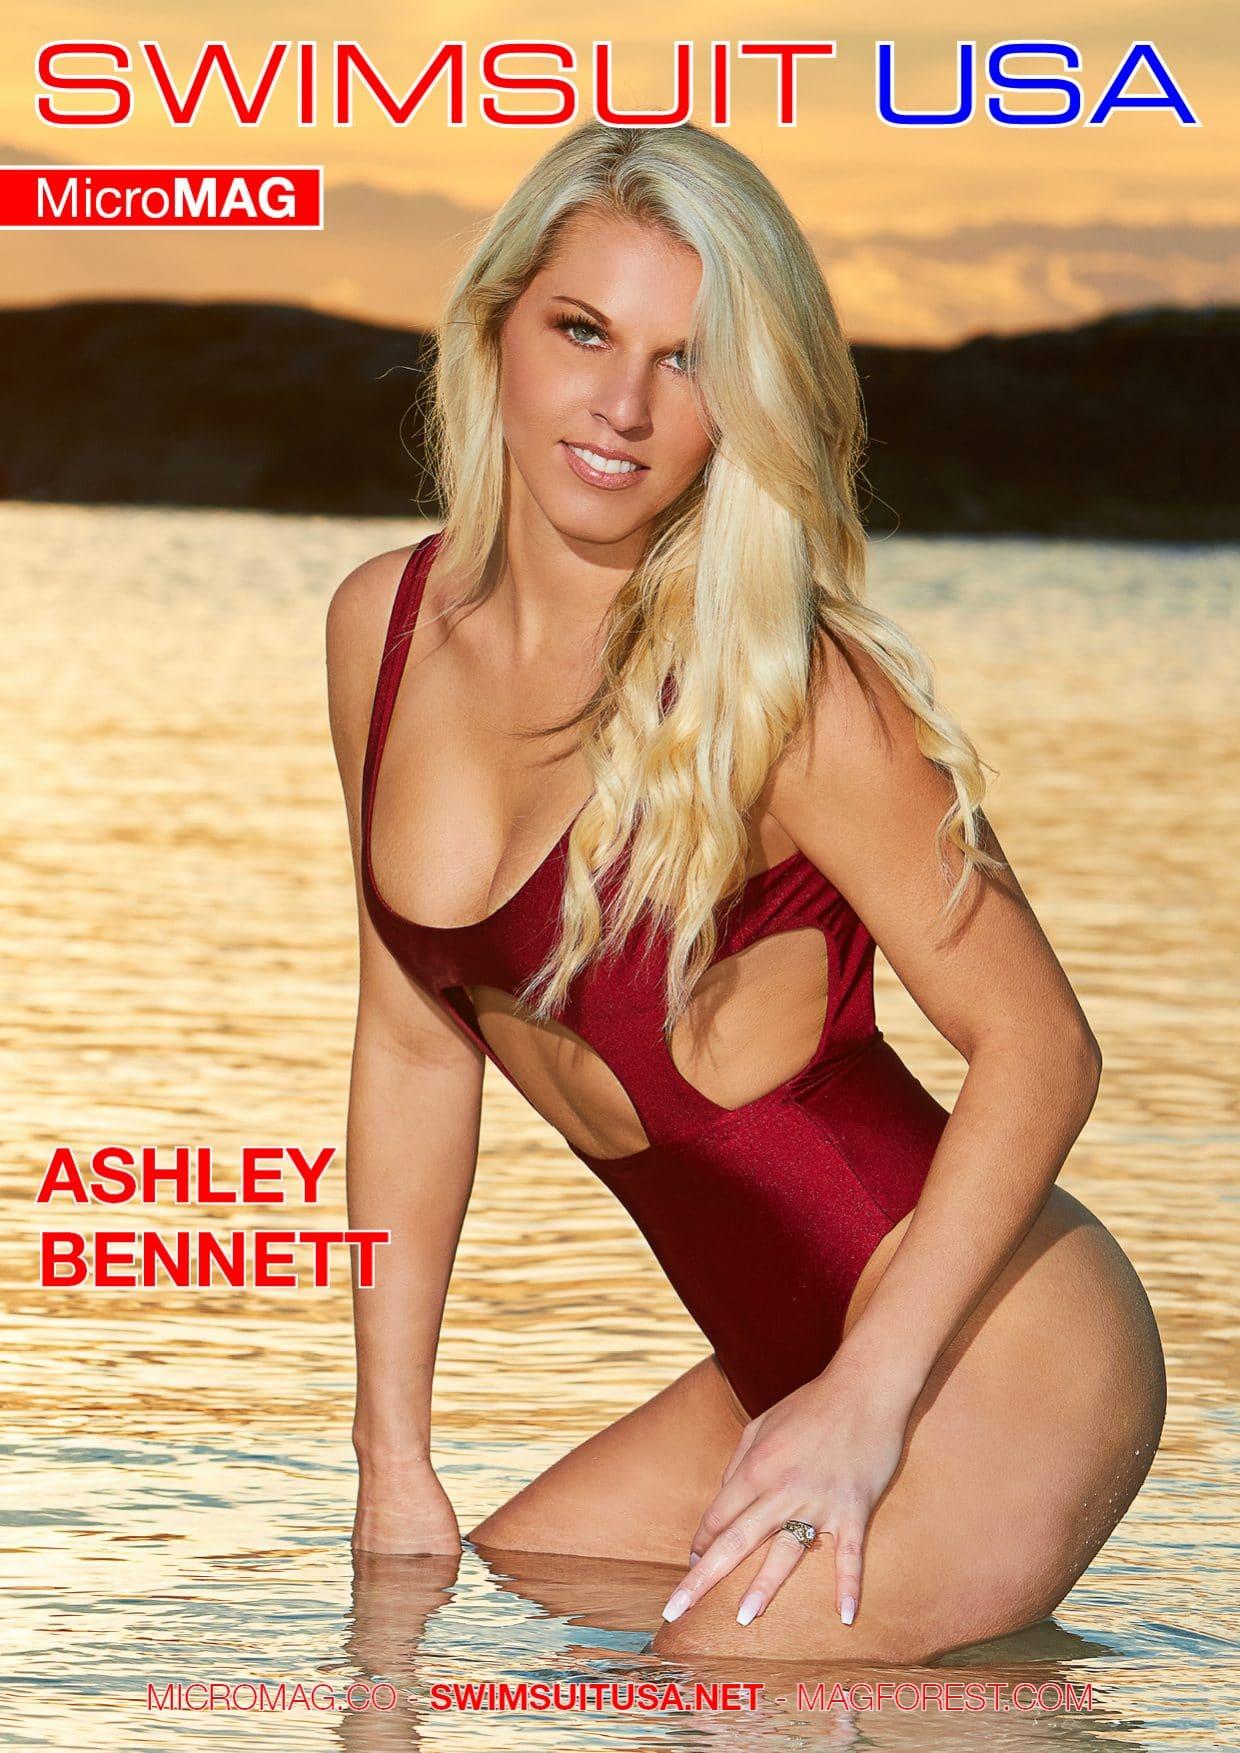 Swimsuit Usa Micromag – Ashley Bennett – Issue 2